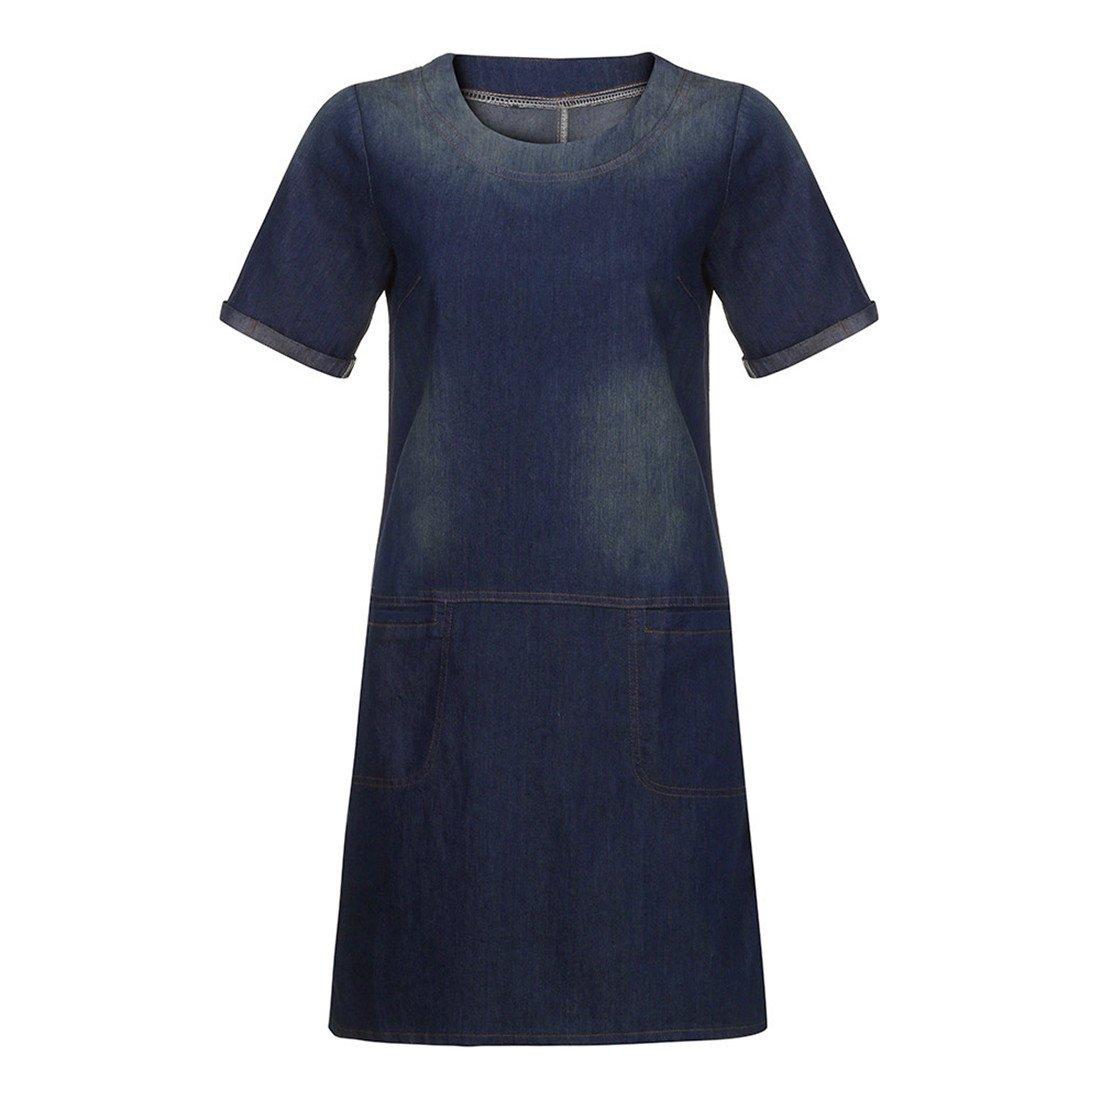 Womens Dresses,Womens Dresses Summer,Womens Dresses Elegant,Womens Dress Casual,Moonuy,Girl Ladies Plus Size Denim Shirt Pocket Loose Casual Short Mini ...